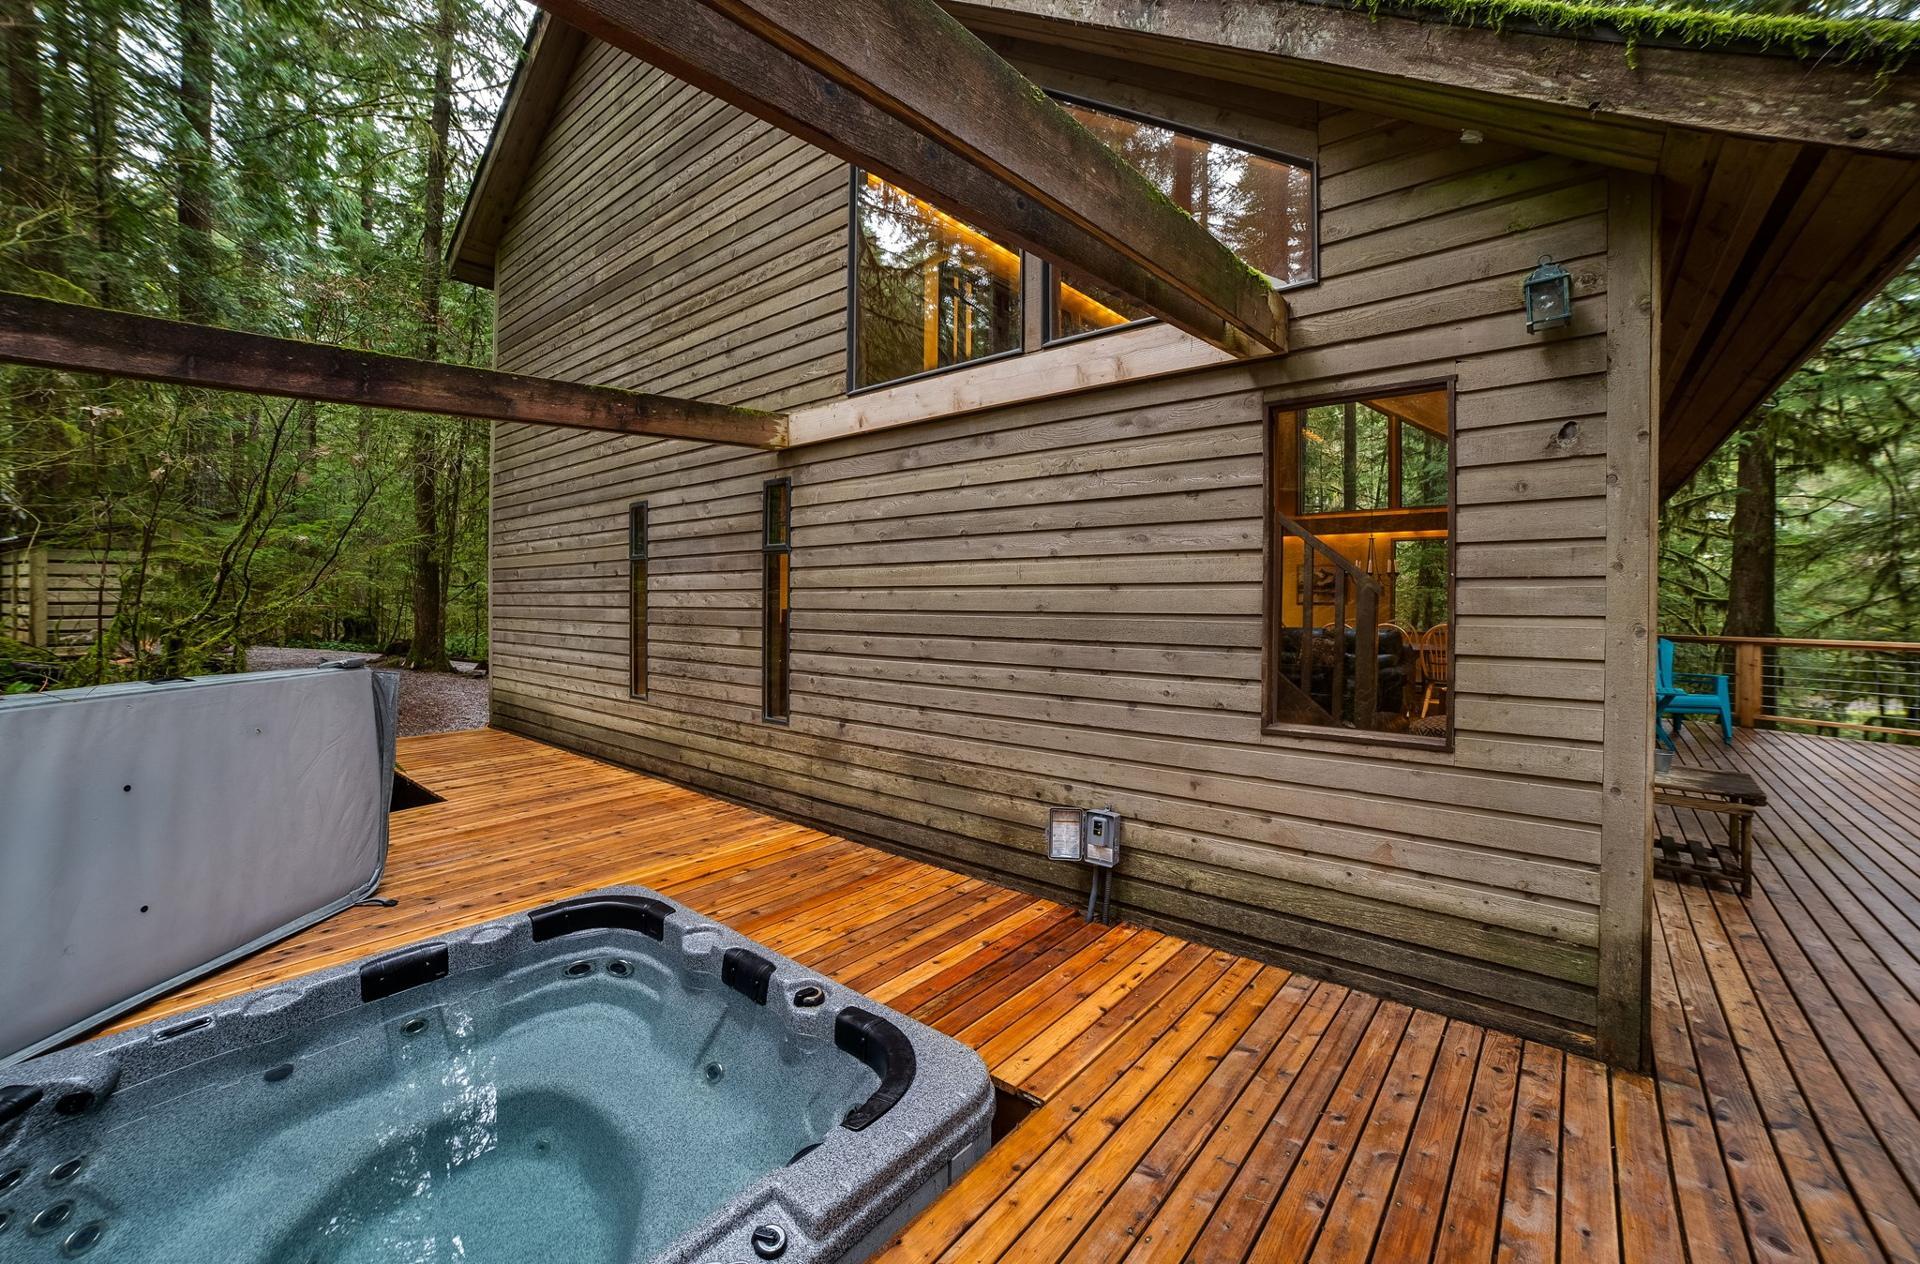 Apartment Mt  Baker Lodging Cabin  55 - HOT TUB  WOOD STOVE  BBQ  SLEEPS 10  photo 3998985